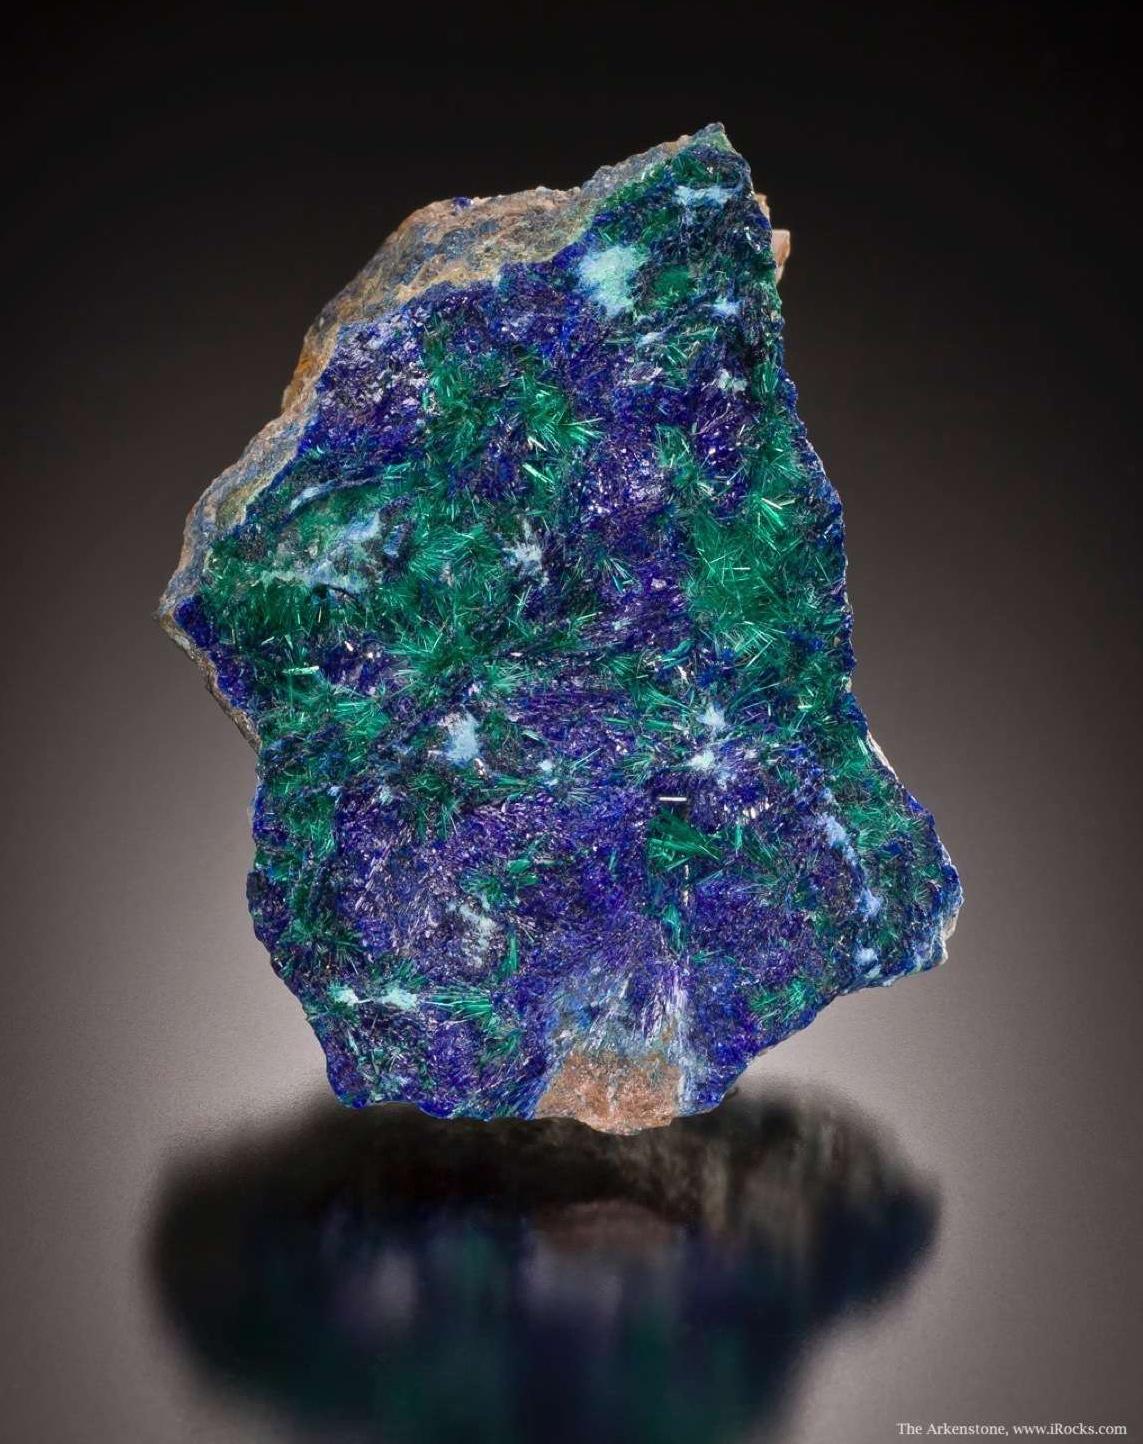 Bright Linarite with Brochantite